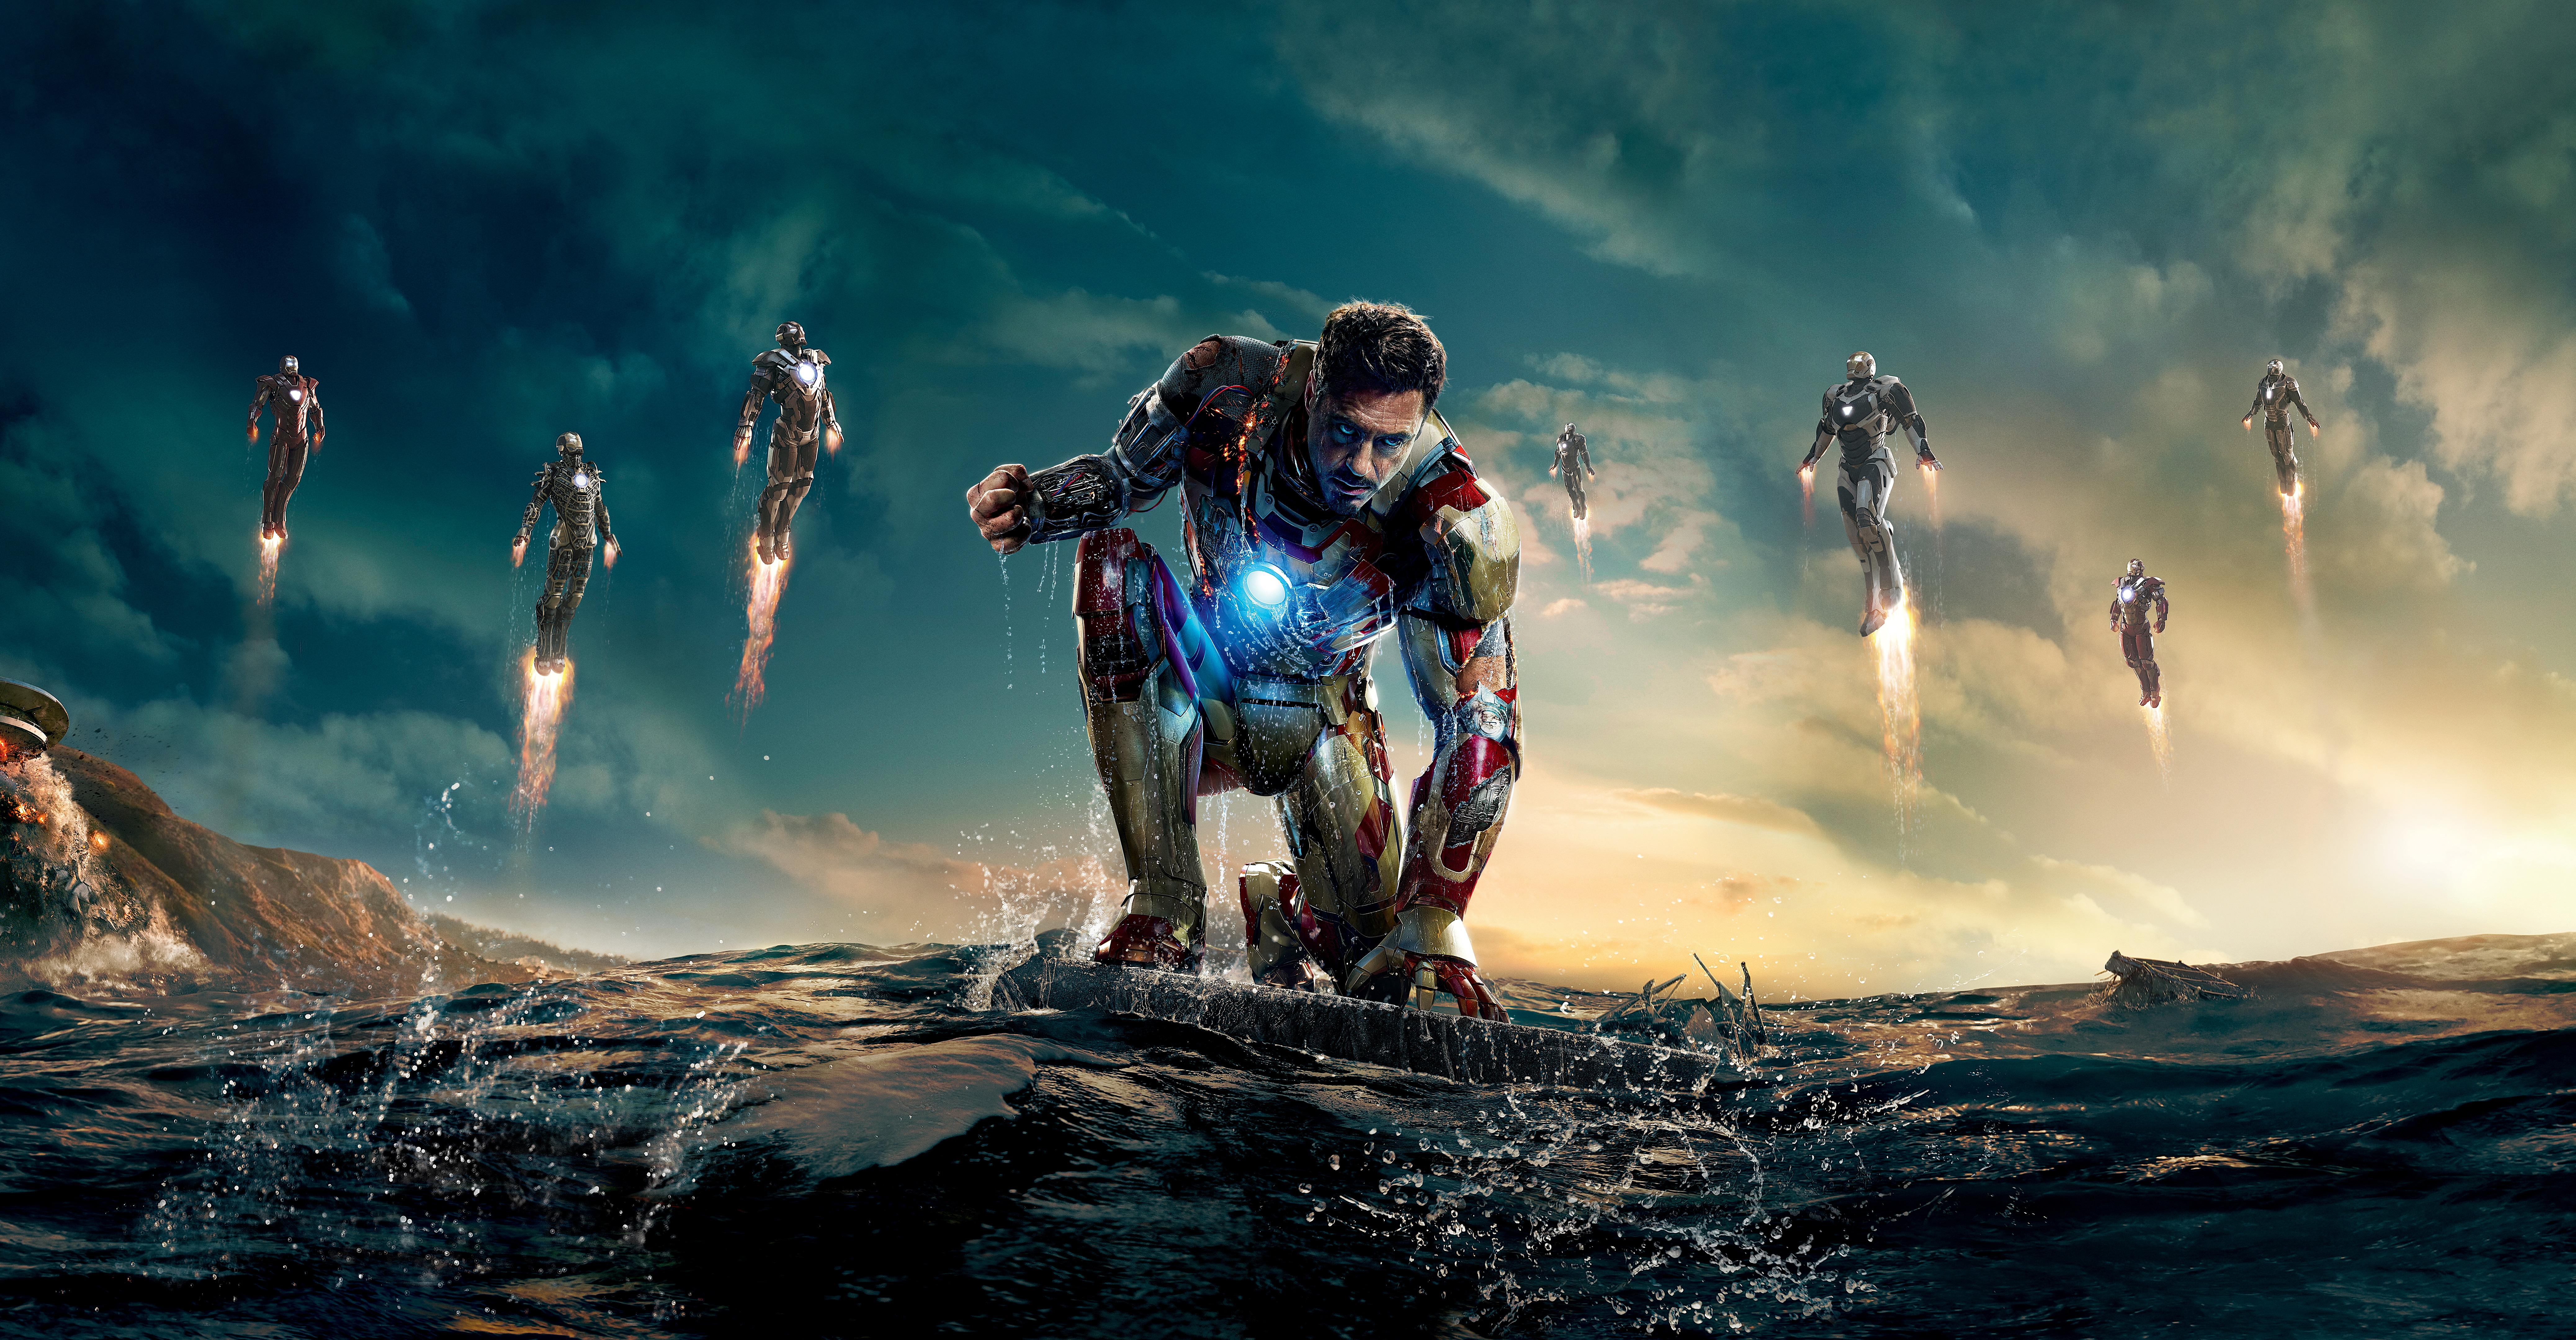 Avengers Iron Man Iron Man 3 Robert Downey Jr Tony Stark 8303x4320